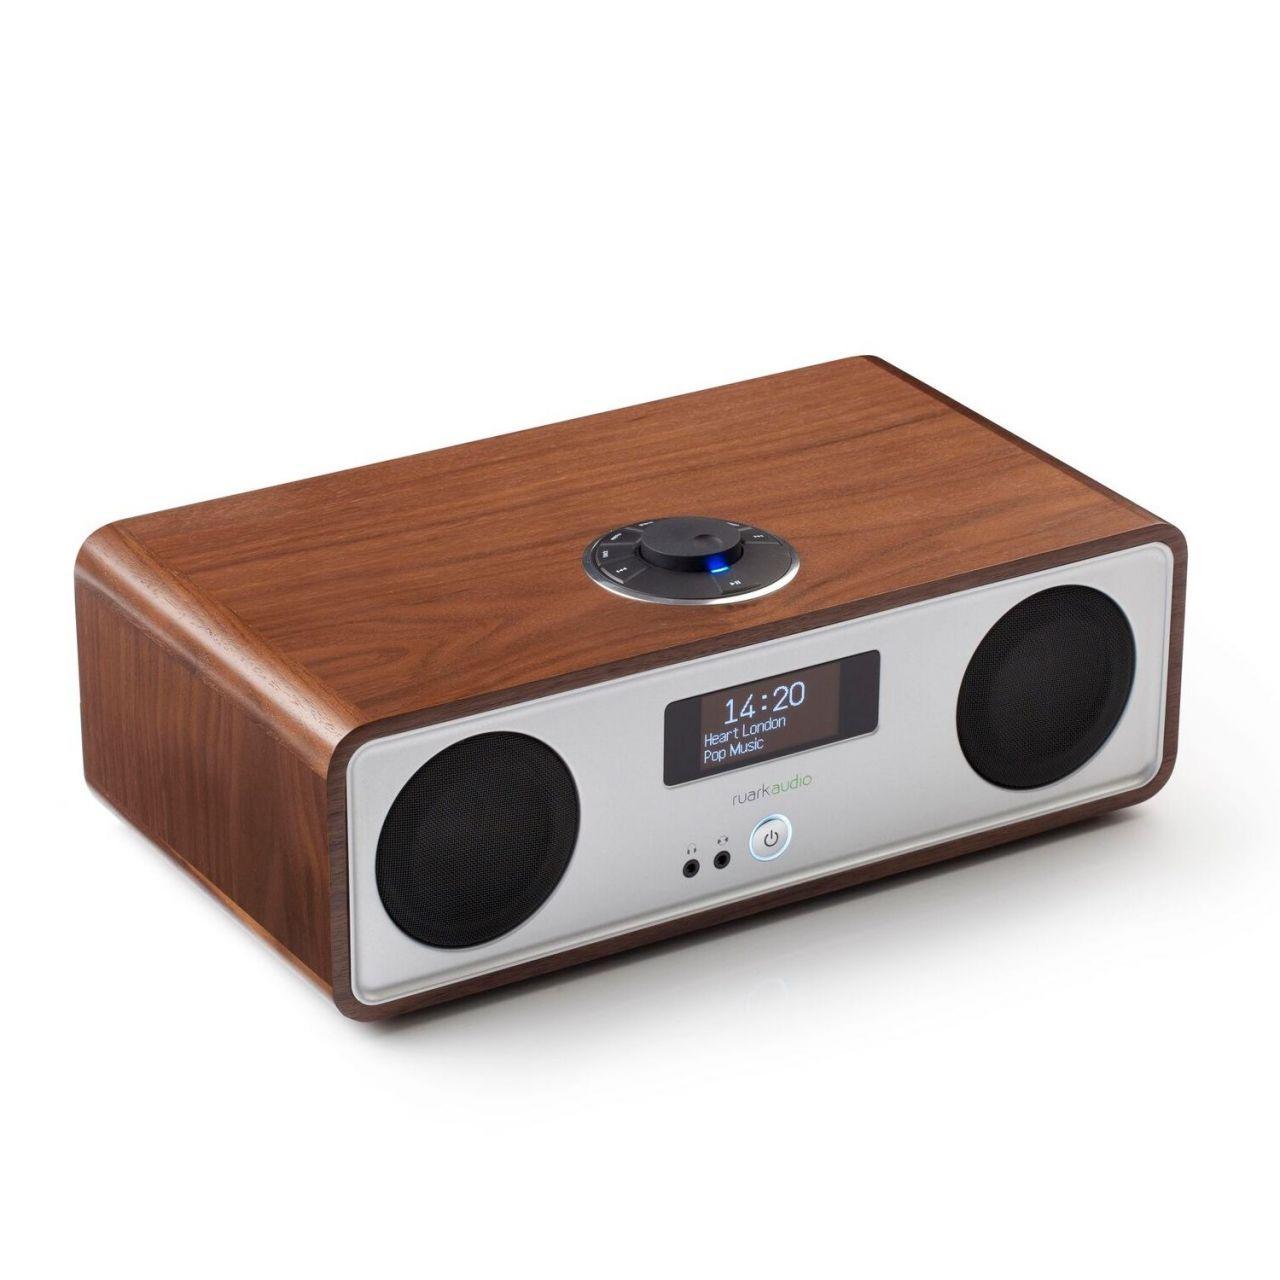 ruark audio - Stereoradio R2 9011